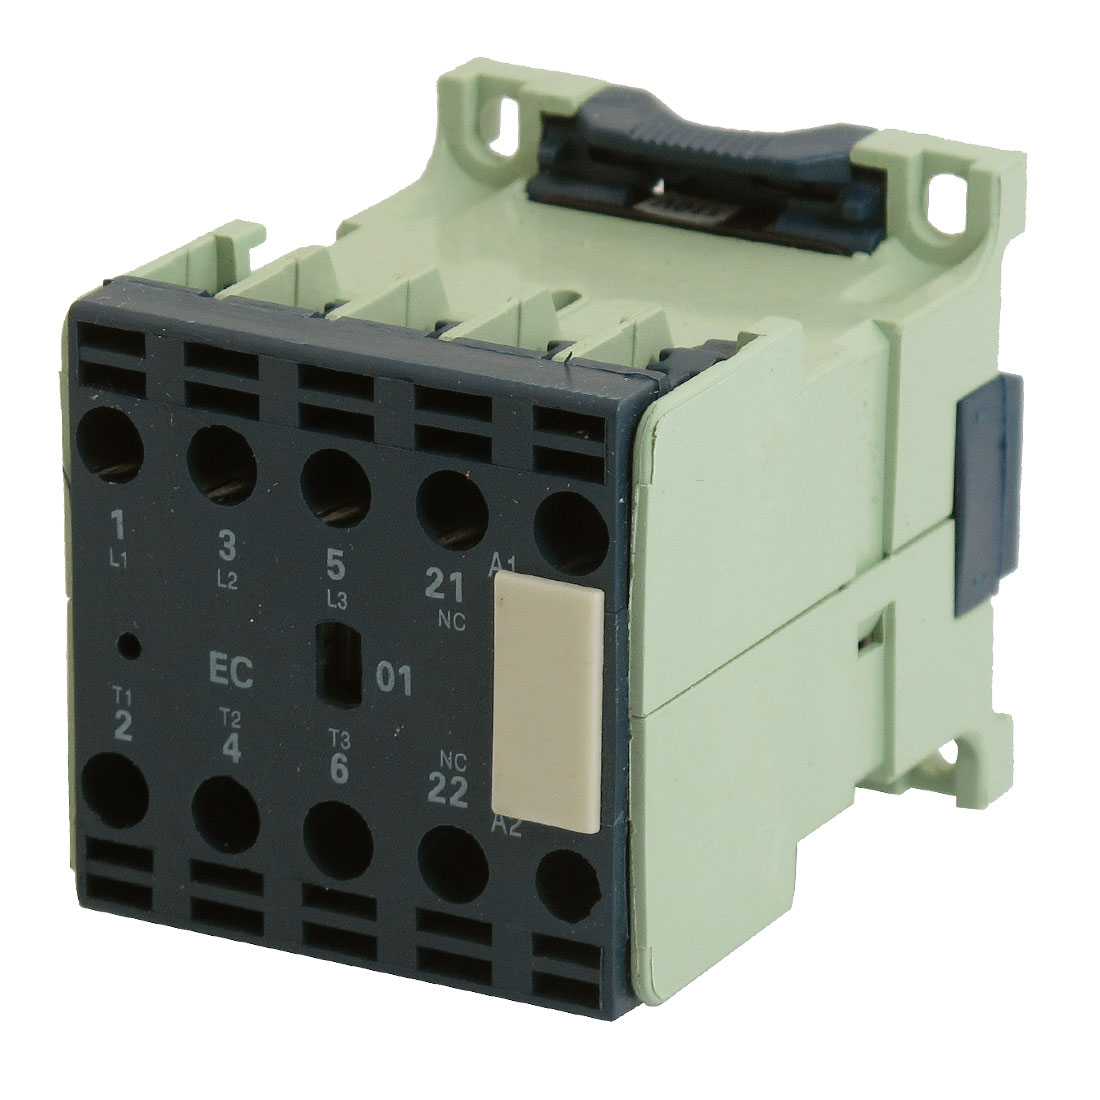 CJX2-6.3/01 110V 50/60Hz Coil 35mm DIN Rail Three Pole 1NC AC Contactor